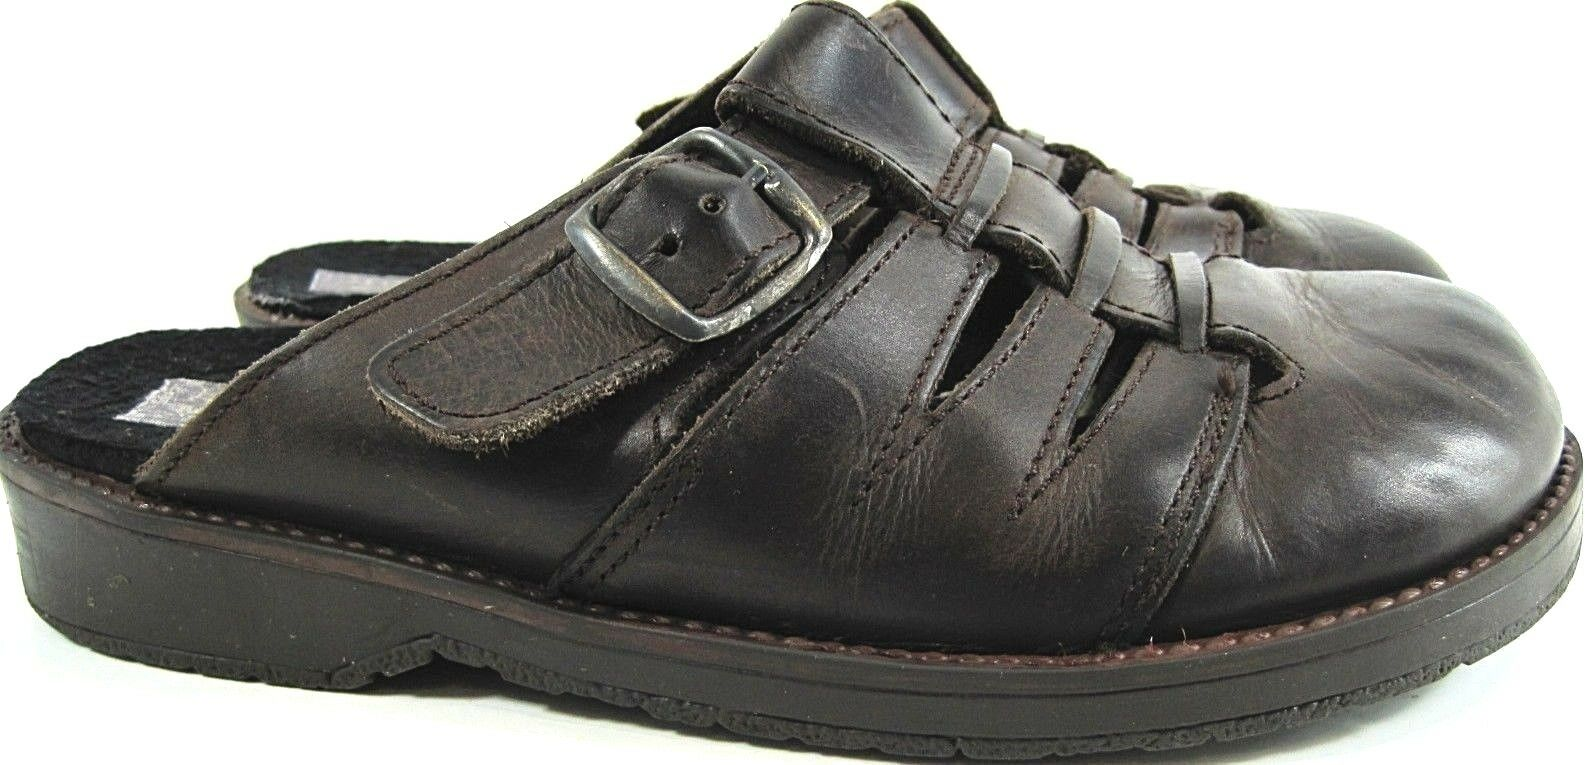 Drexlite Damens Leder Sandales Größe 6.5 Euro 36 Braun Made In Spain